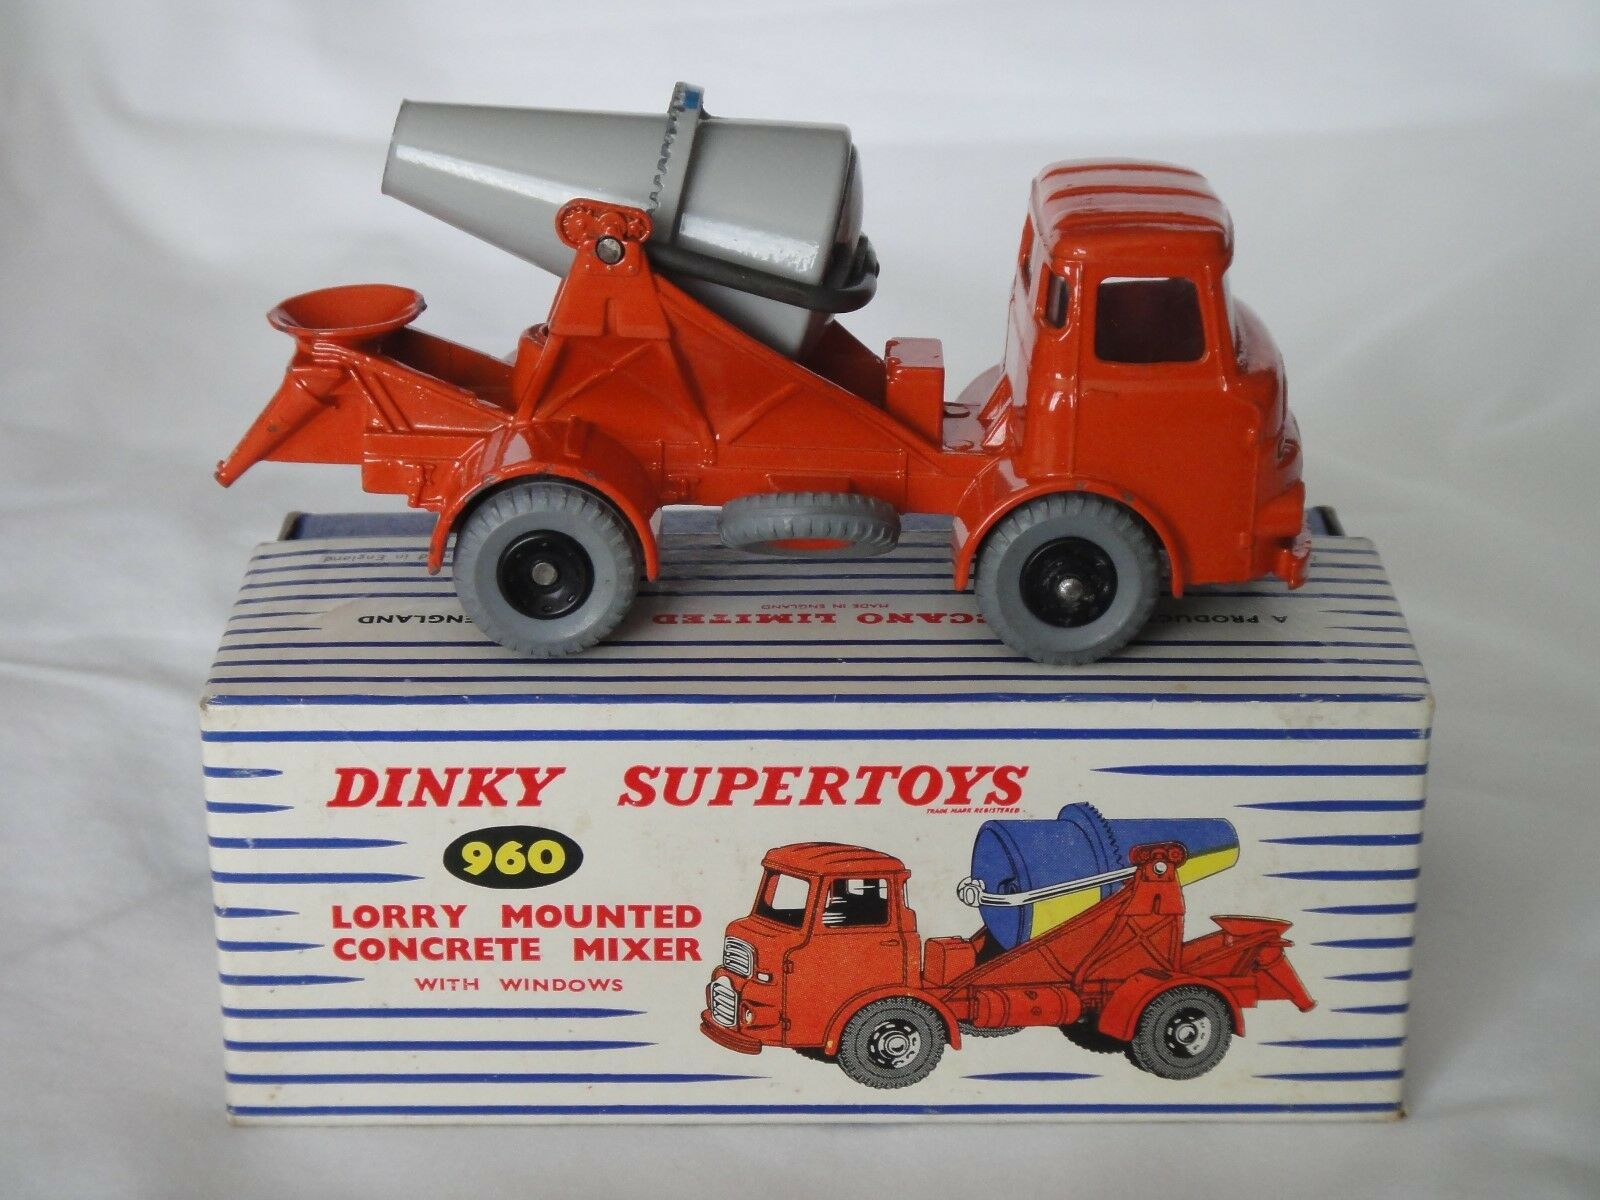 DINKY SUPERTOYS 960 ALBION MOUNTED CONCRETE MIXER + ORIGINAL BOX